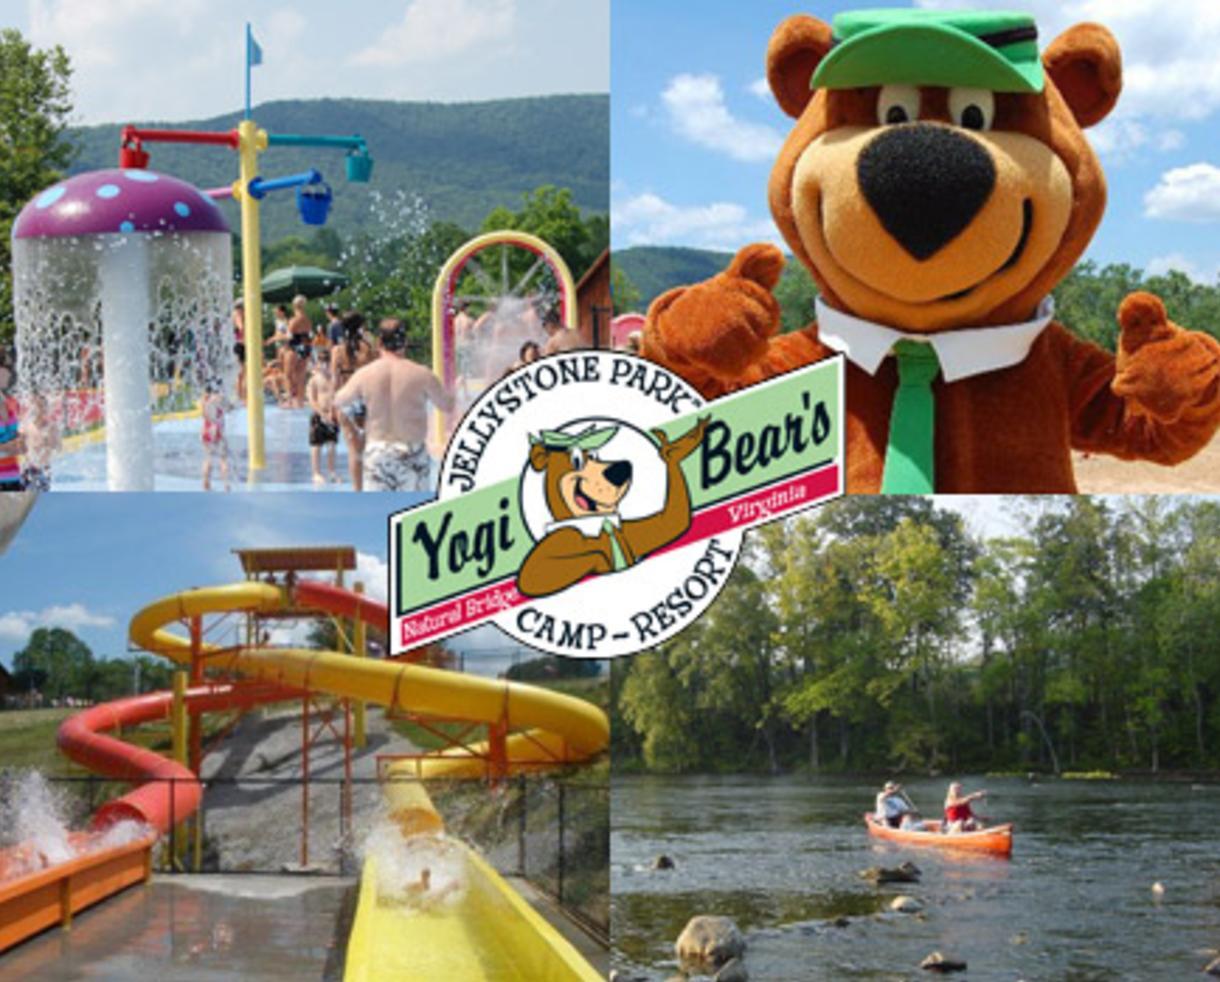 Deal 73 For Yogi Natural Bridge Va 2 Night Vacation Yogi Bear S Jellystone Park In Natural Bridge Va 50 Off Certifikid